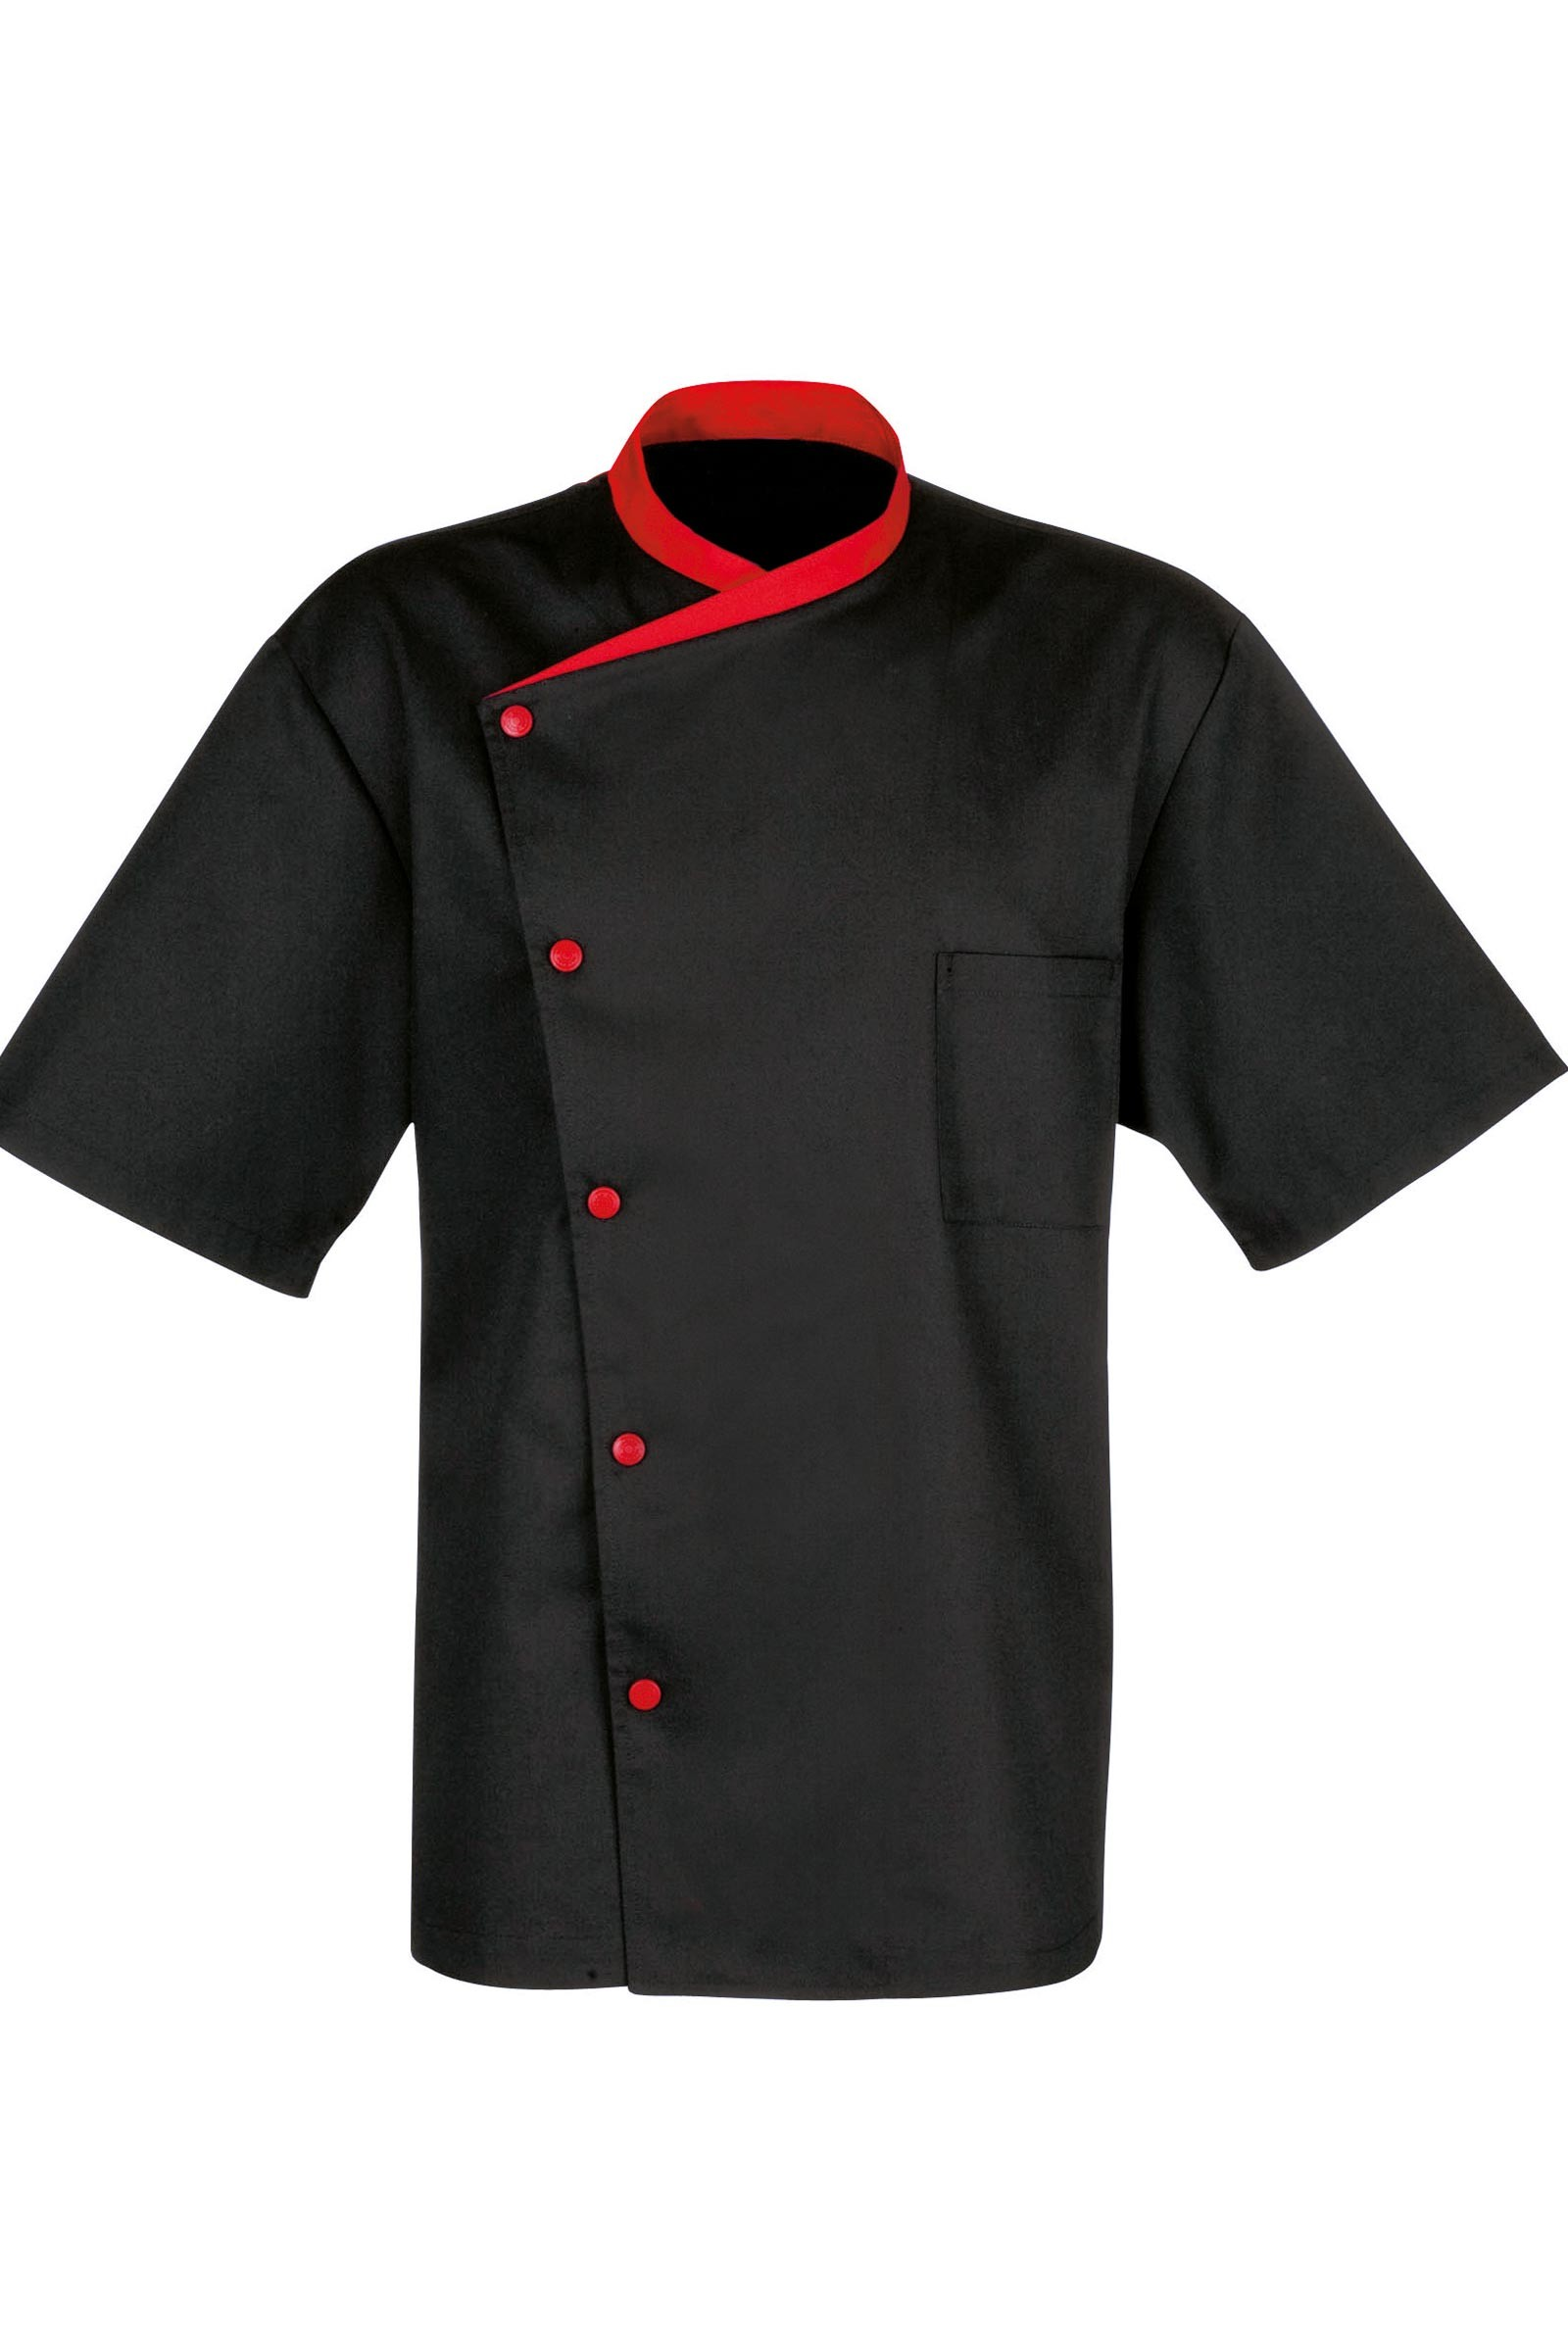 veste cuisine logo,veste de cuisine elis,veste cuisine noir ...